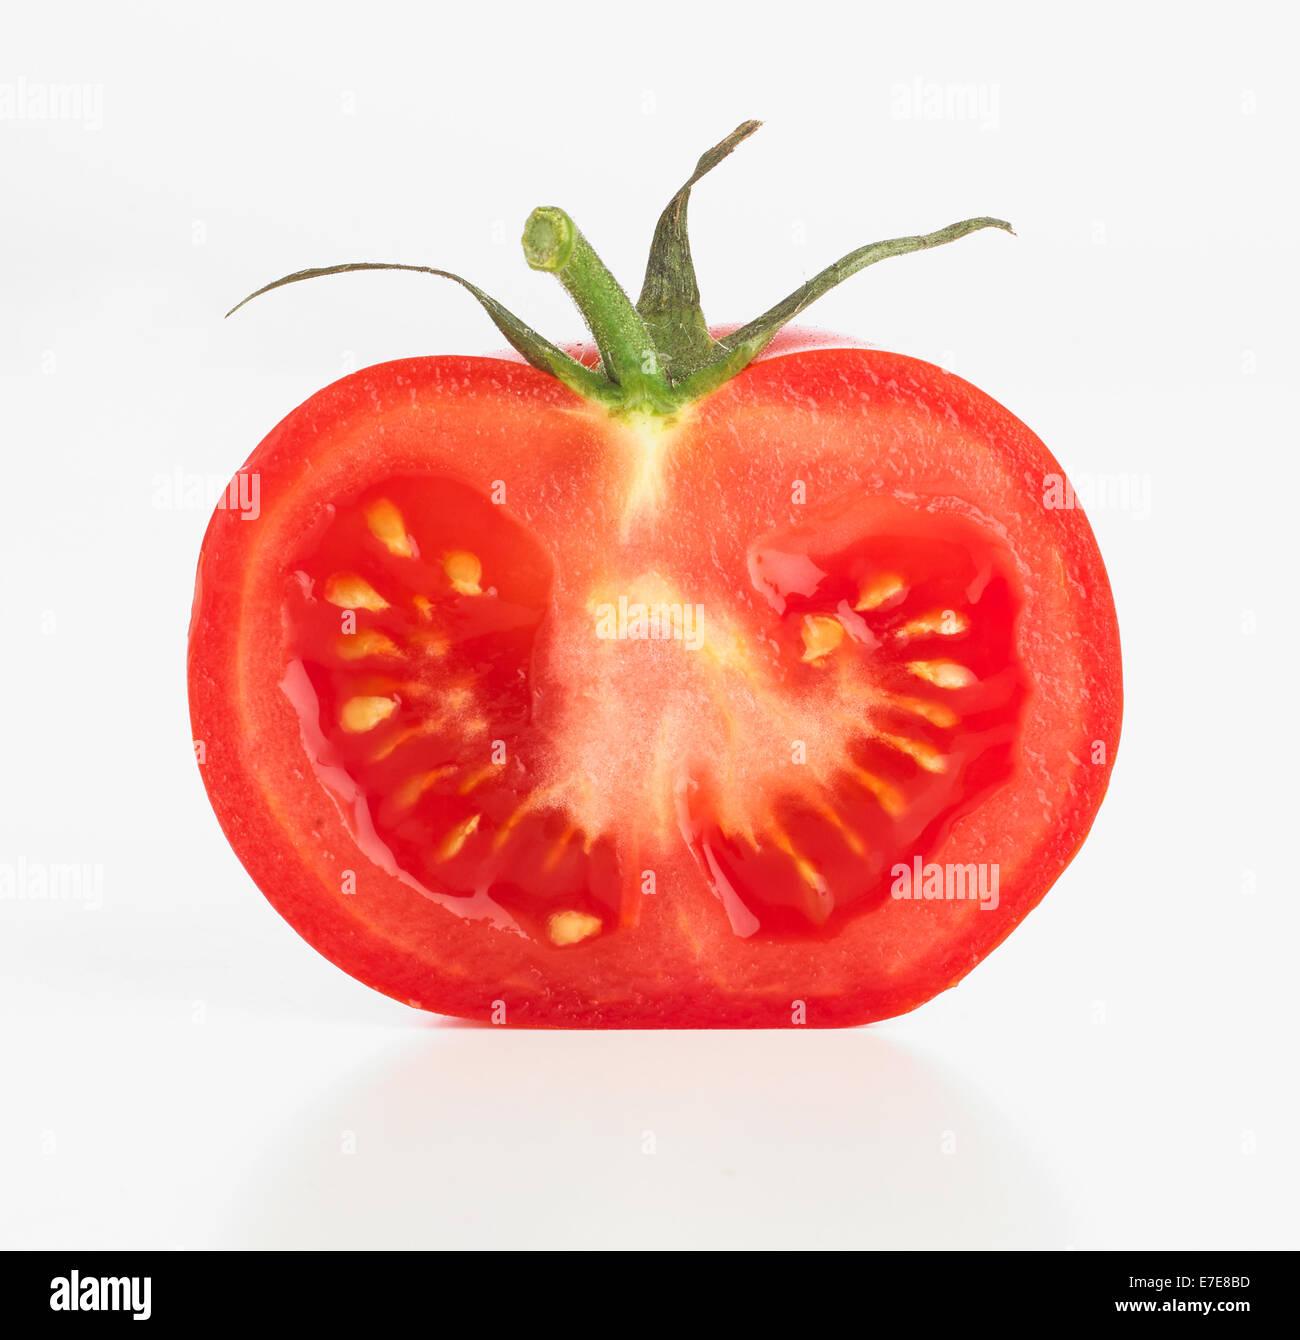 sliced tomato stock photo 73457985 alamy